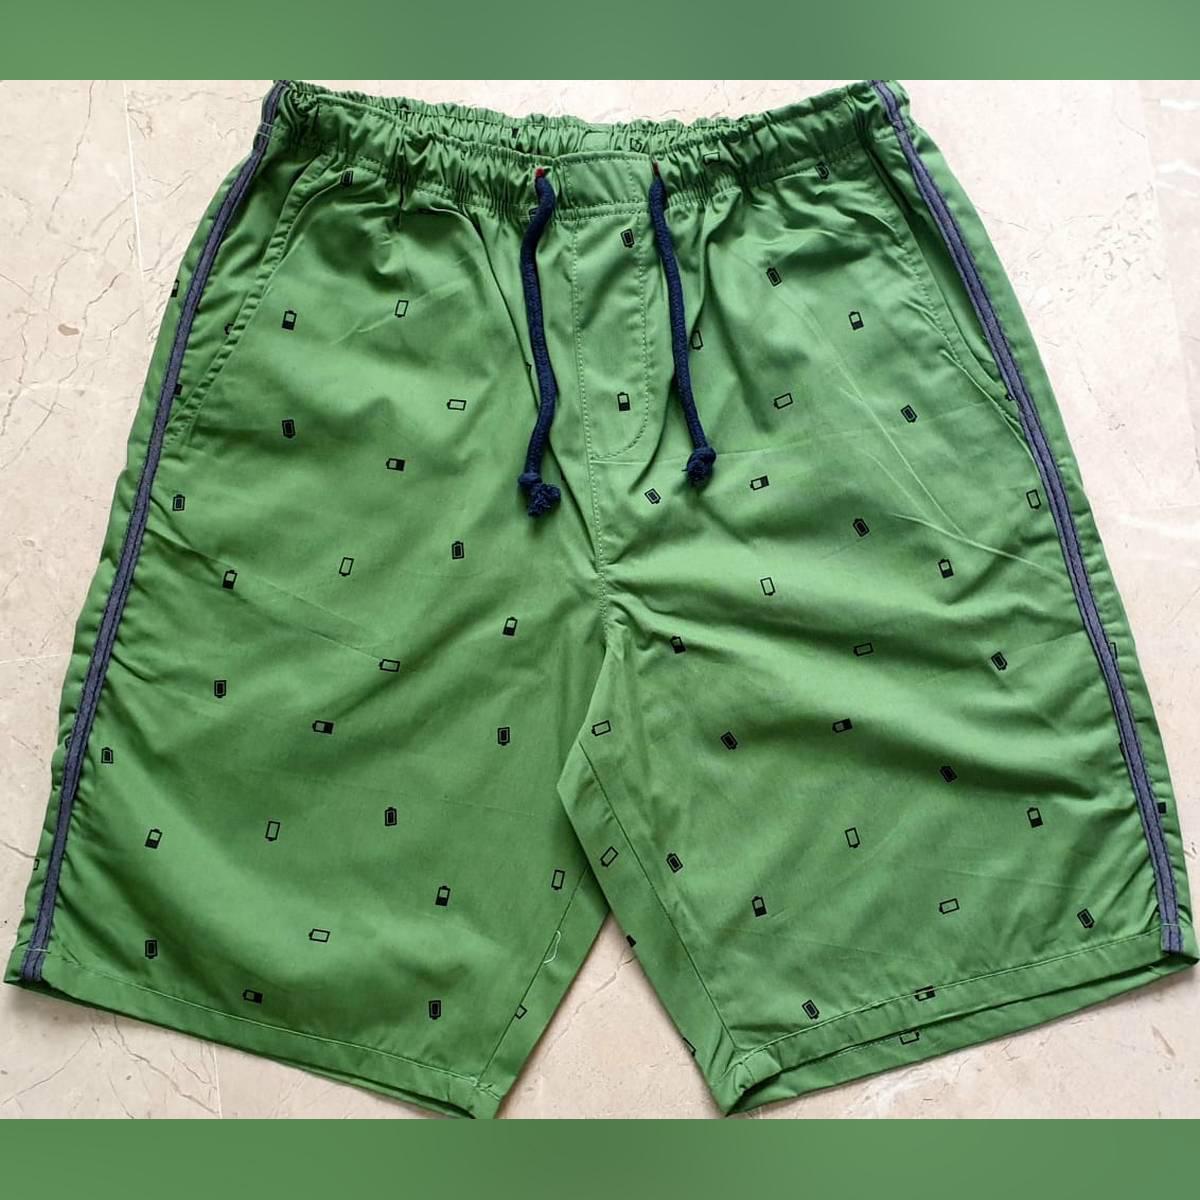 PRINTED GREEN COTTON SUMMER SHORT